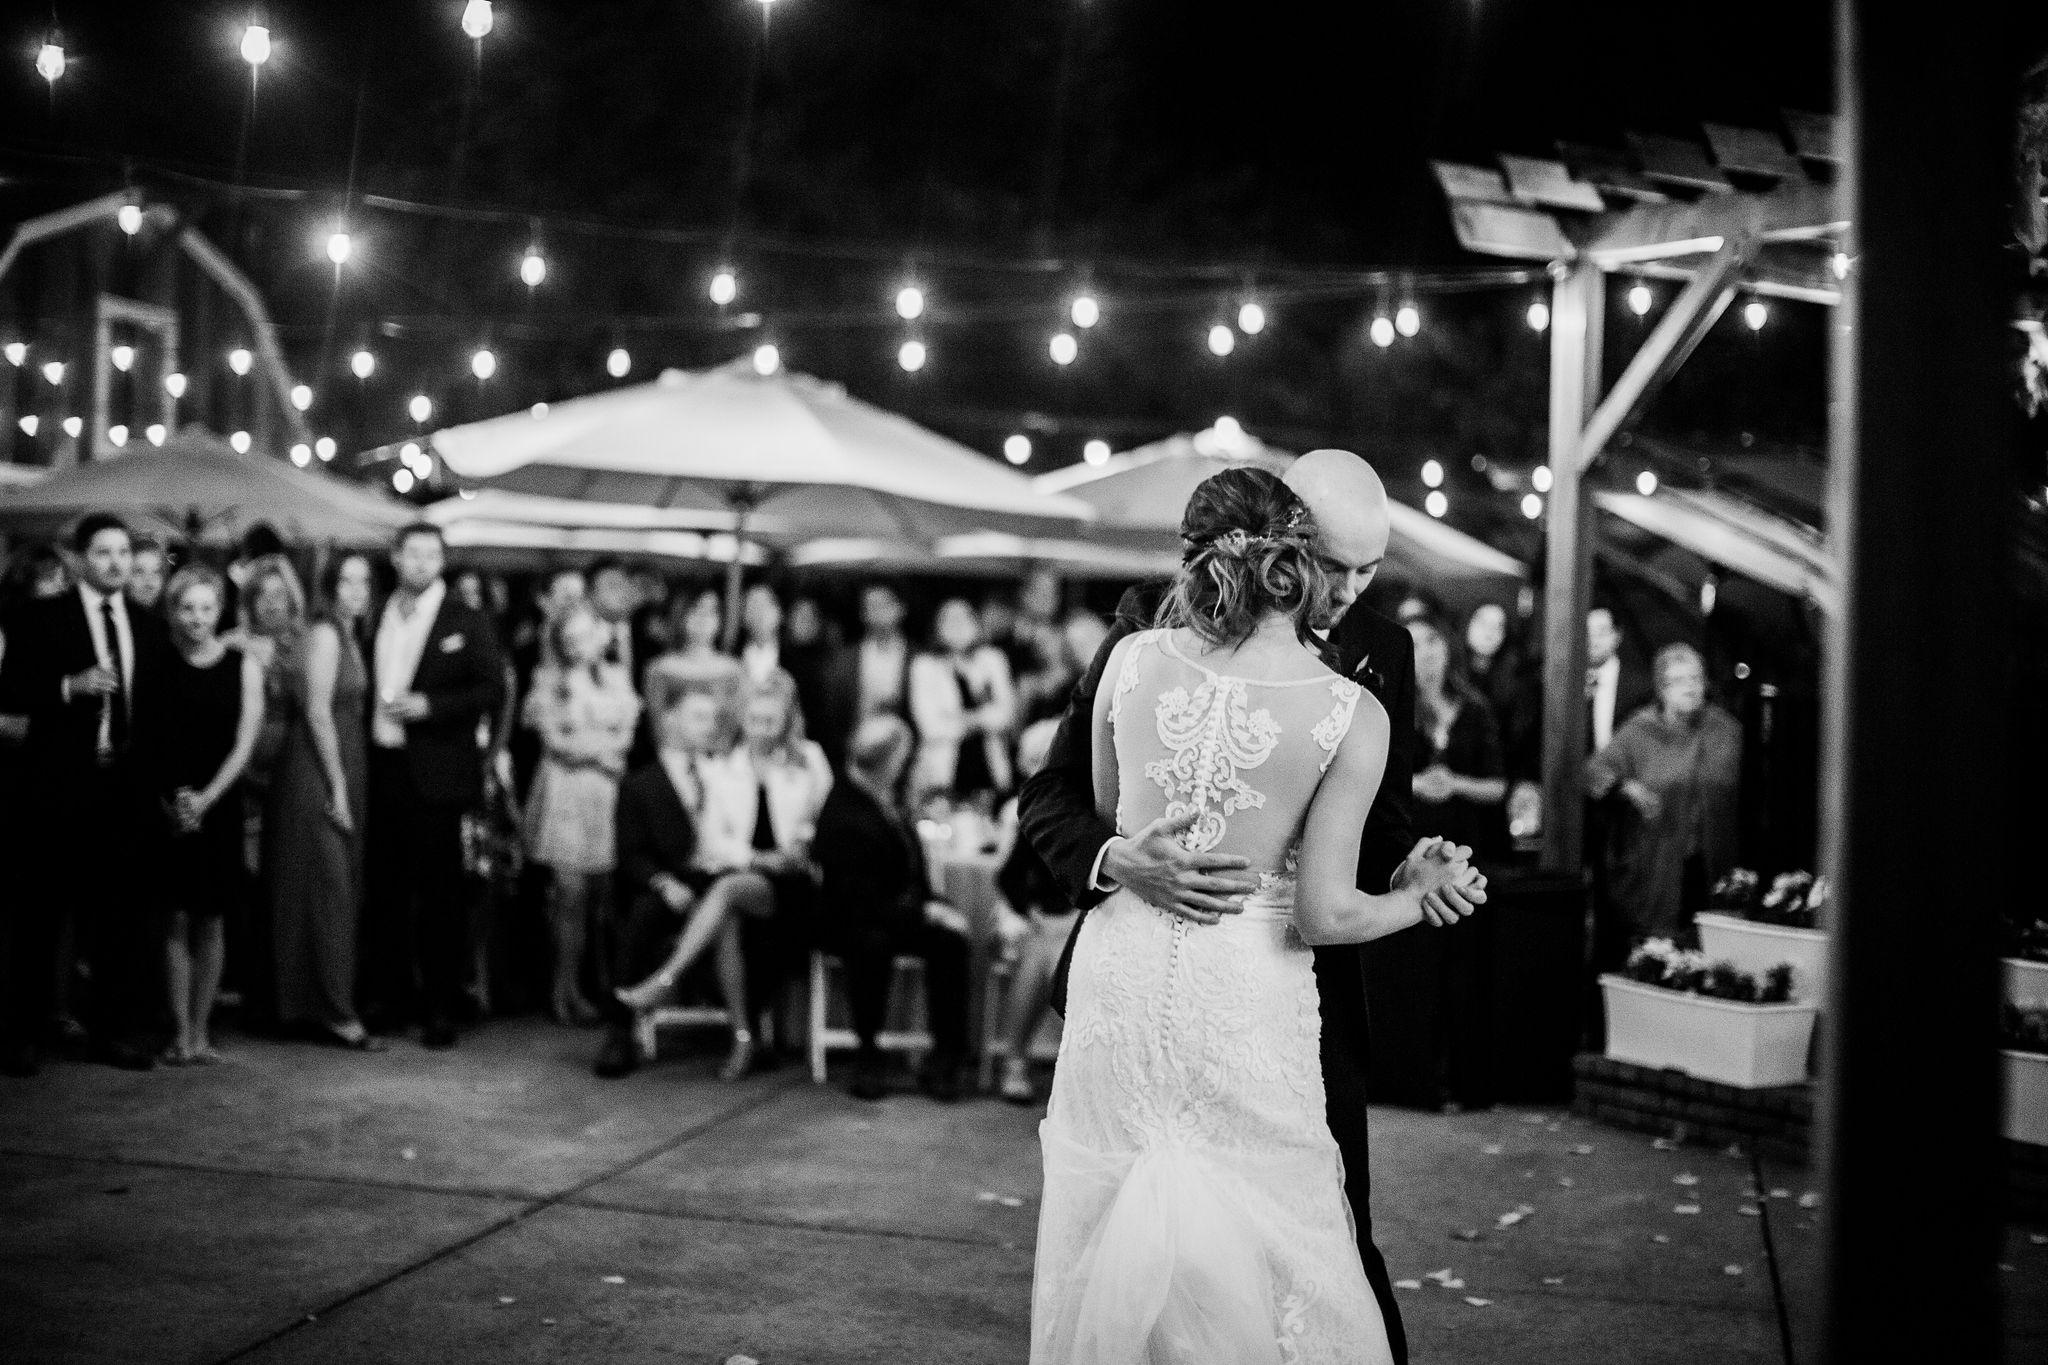 wedding-first-dance-sf-bay-area